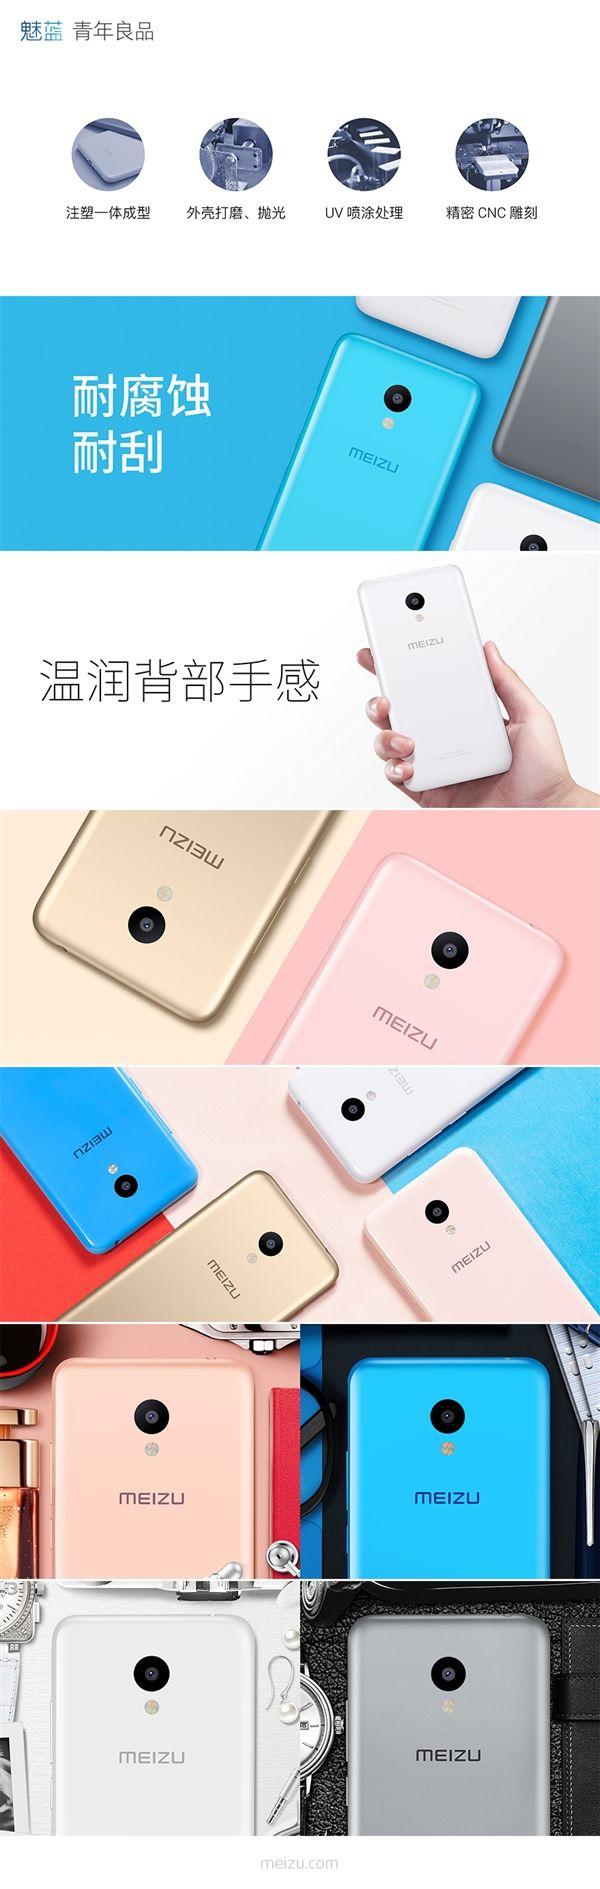 Meizu M3 (Meilan 3, M3 Mini, Blue Charm 3) представлен официально: $92 за версию 2+16 ГБ и $123 за версию 3+32 ГБ – фото 11